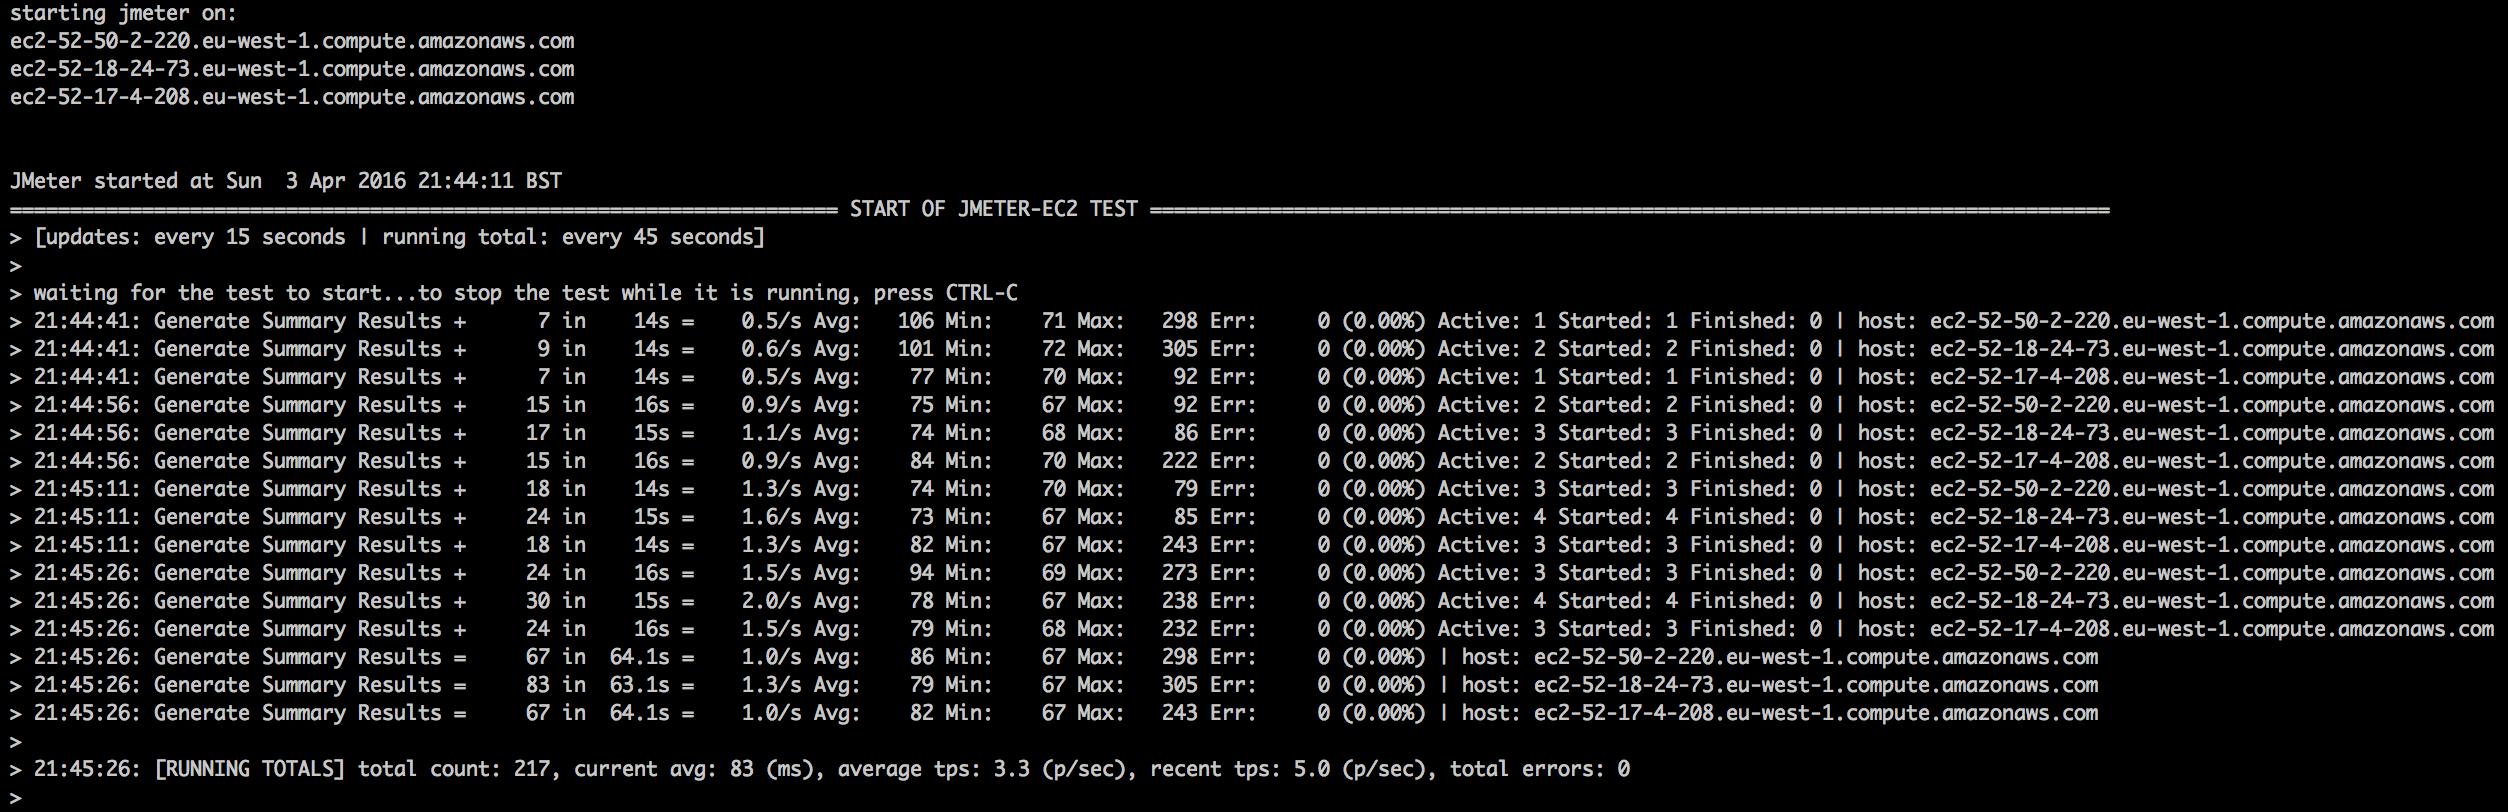 jmeter-ec2-screenshot-1